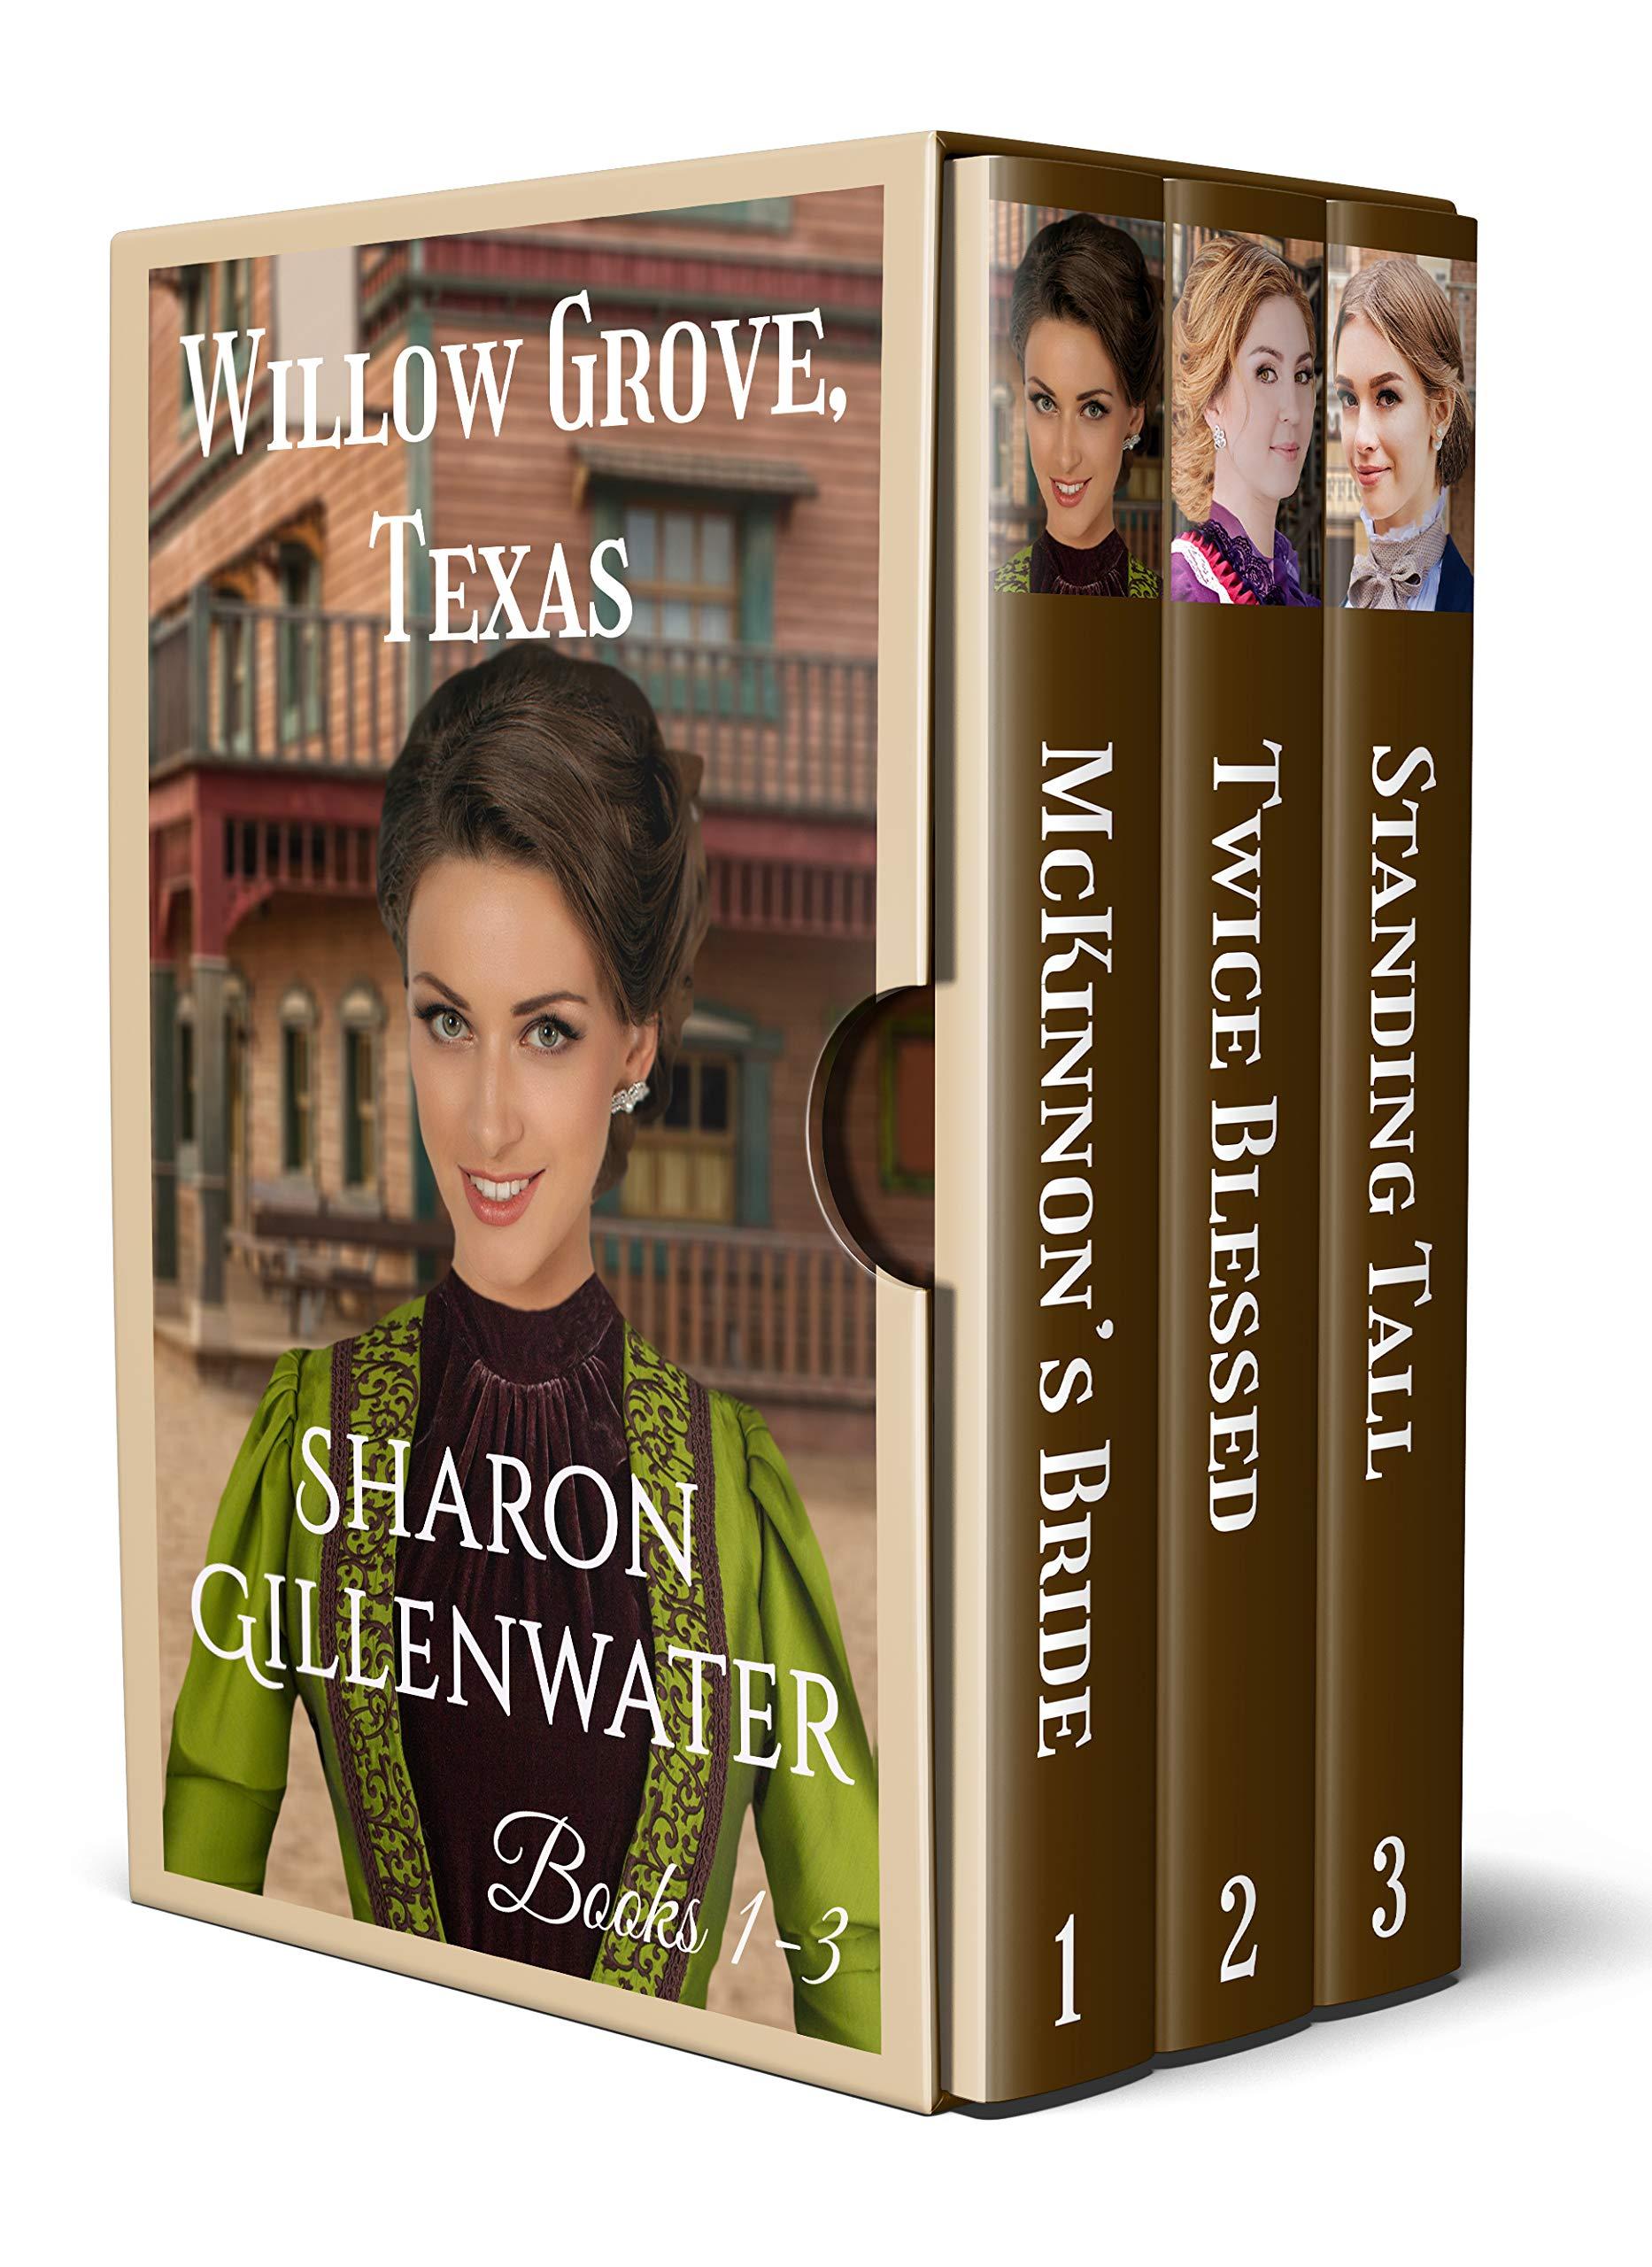 Willow Grove, Texas Box Set: Books 1-3: Christian Historical Western Romance